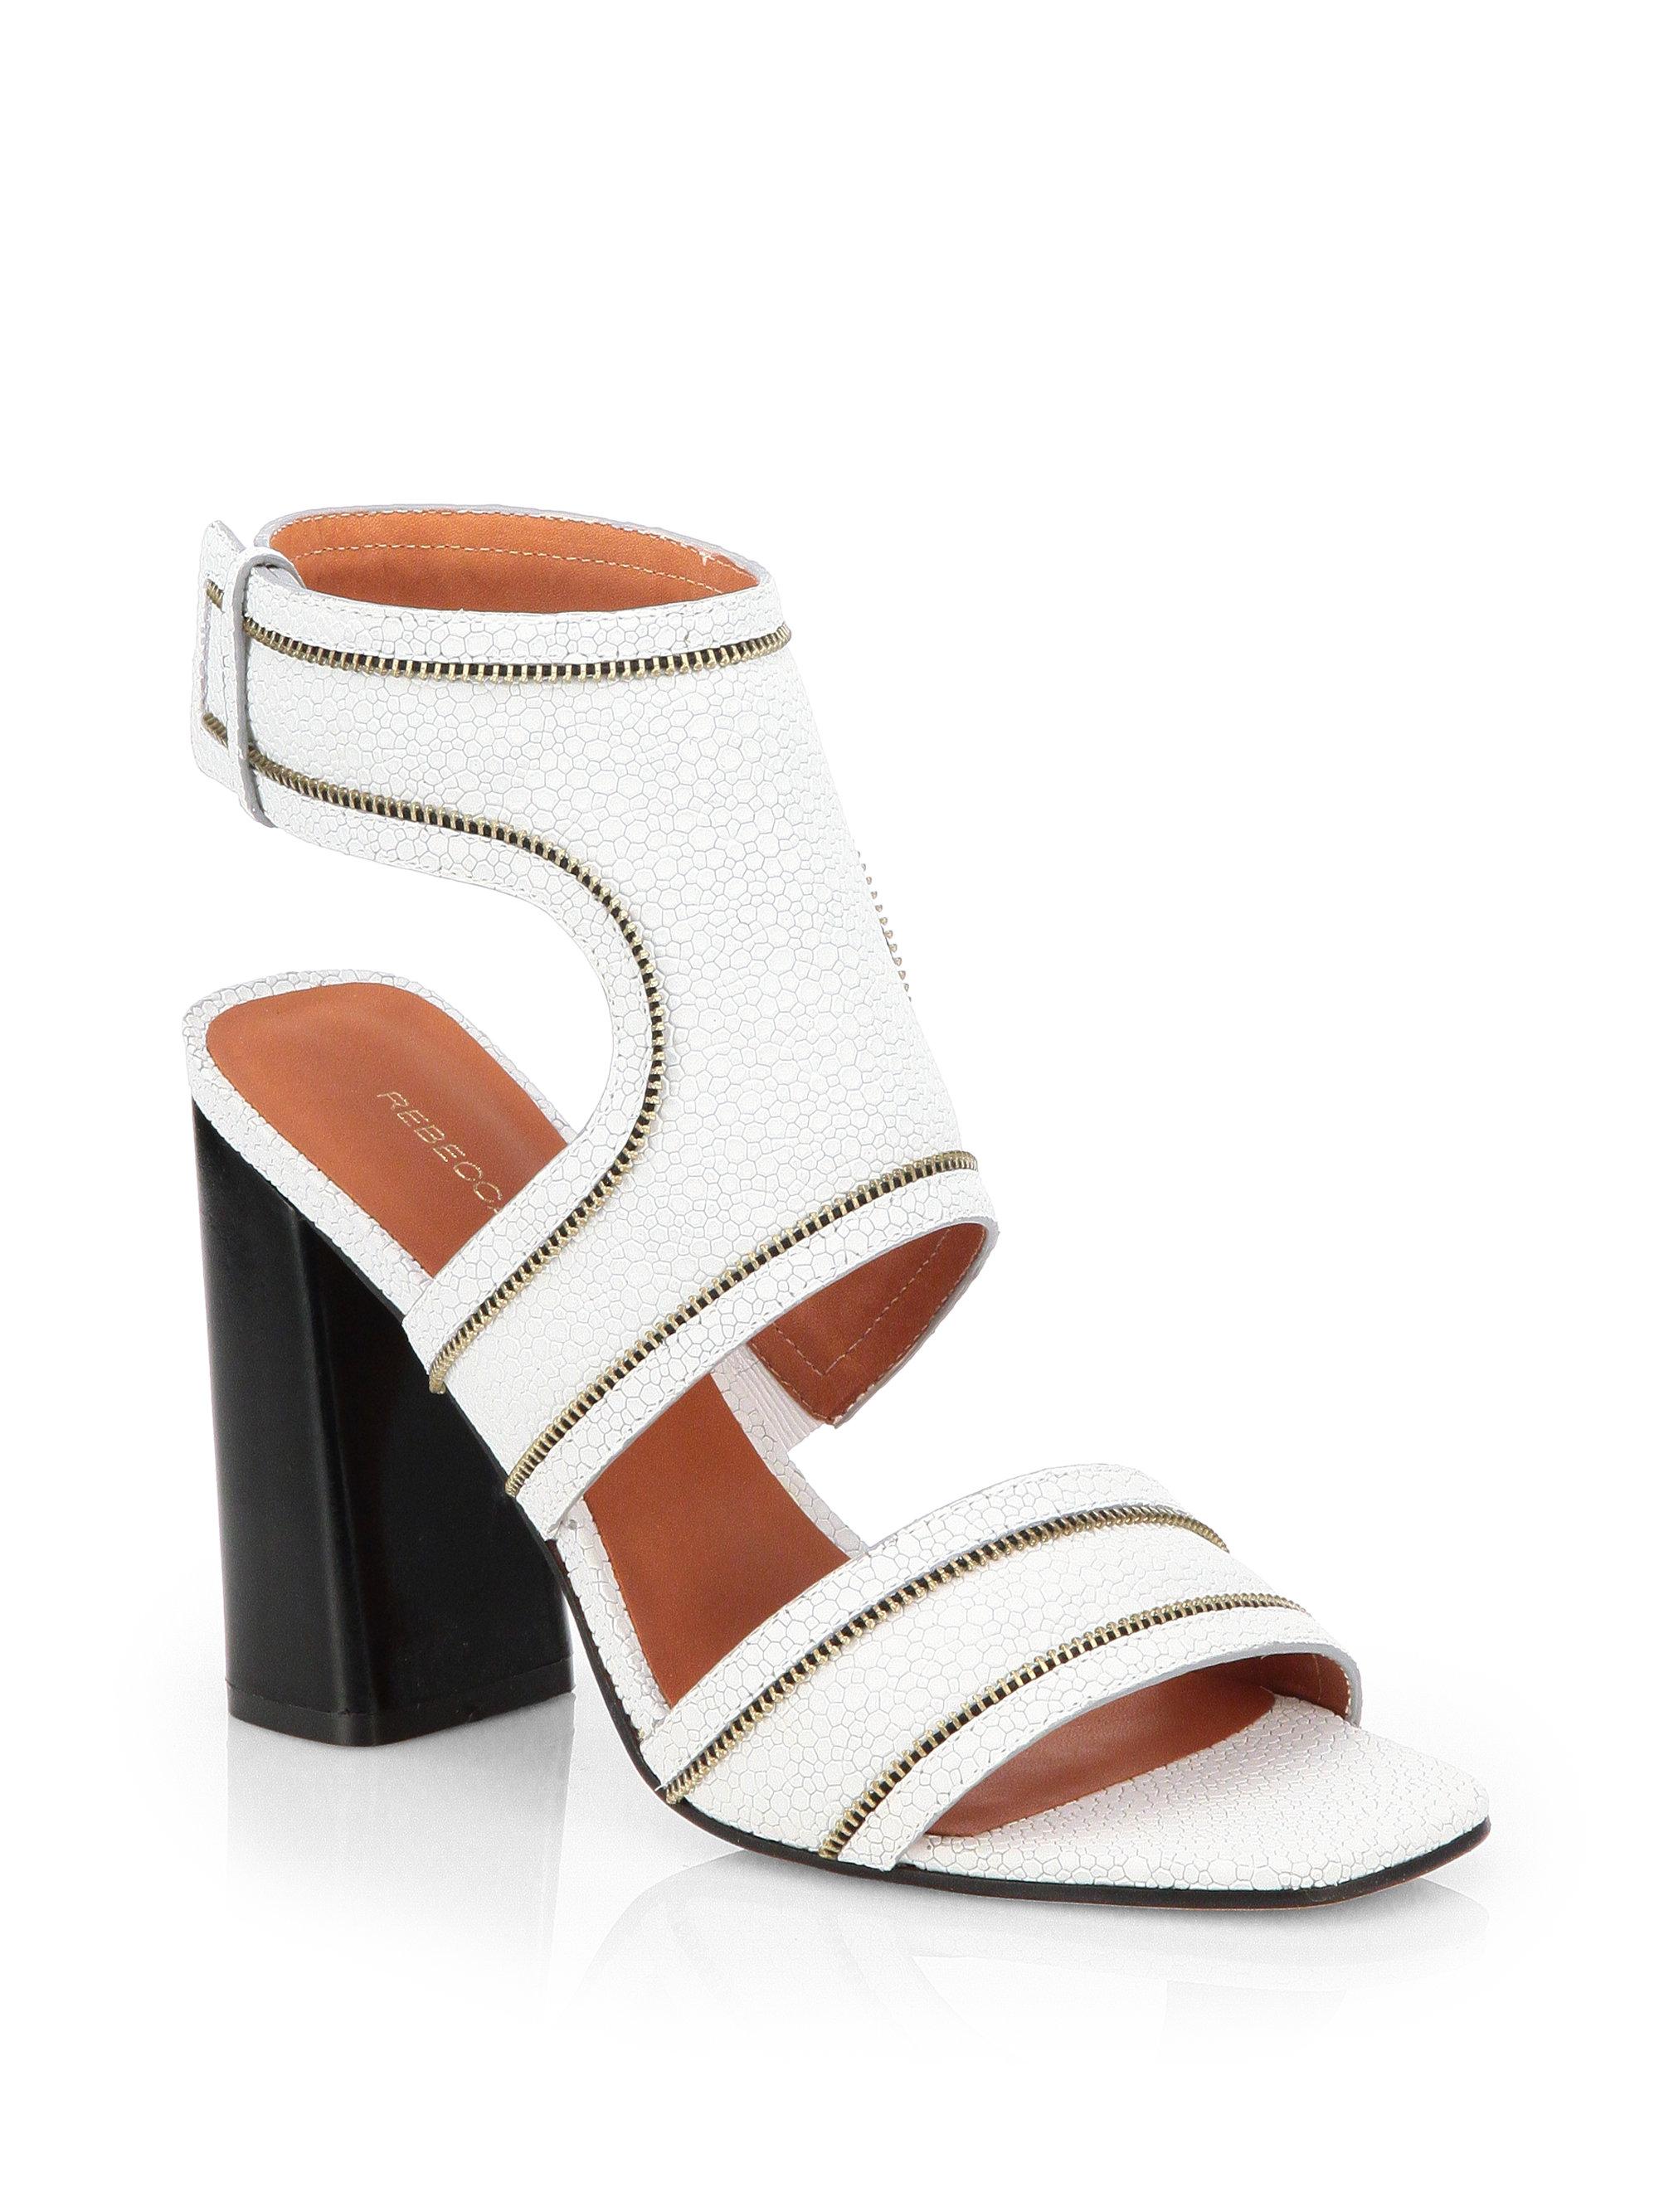 2ed0b314b8e Rebecca Minkoff Parker Zippertrimmed Leather Sandals in White - Lyst